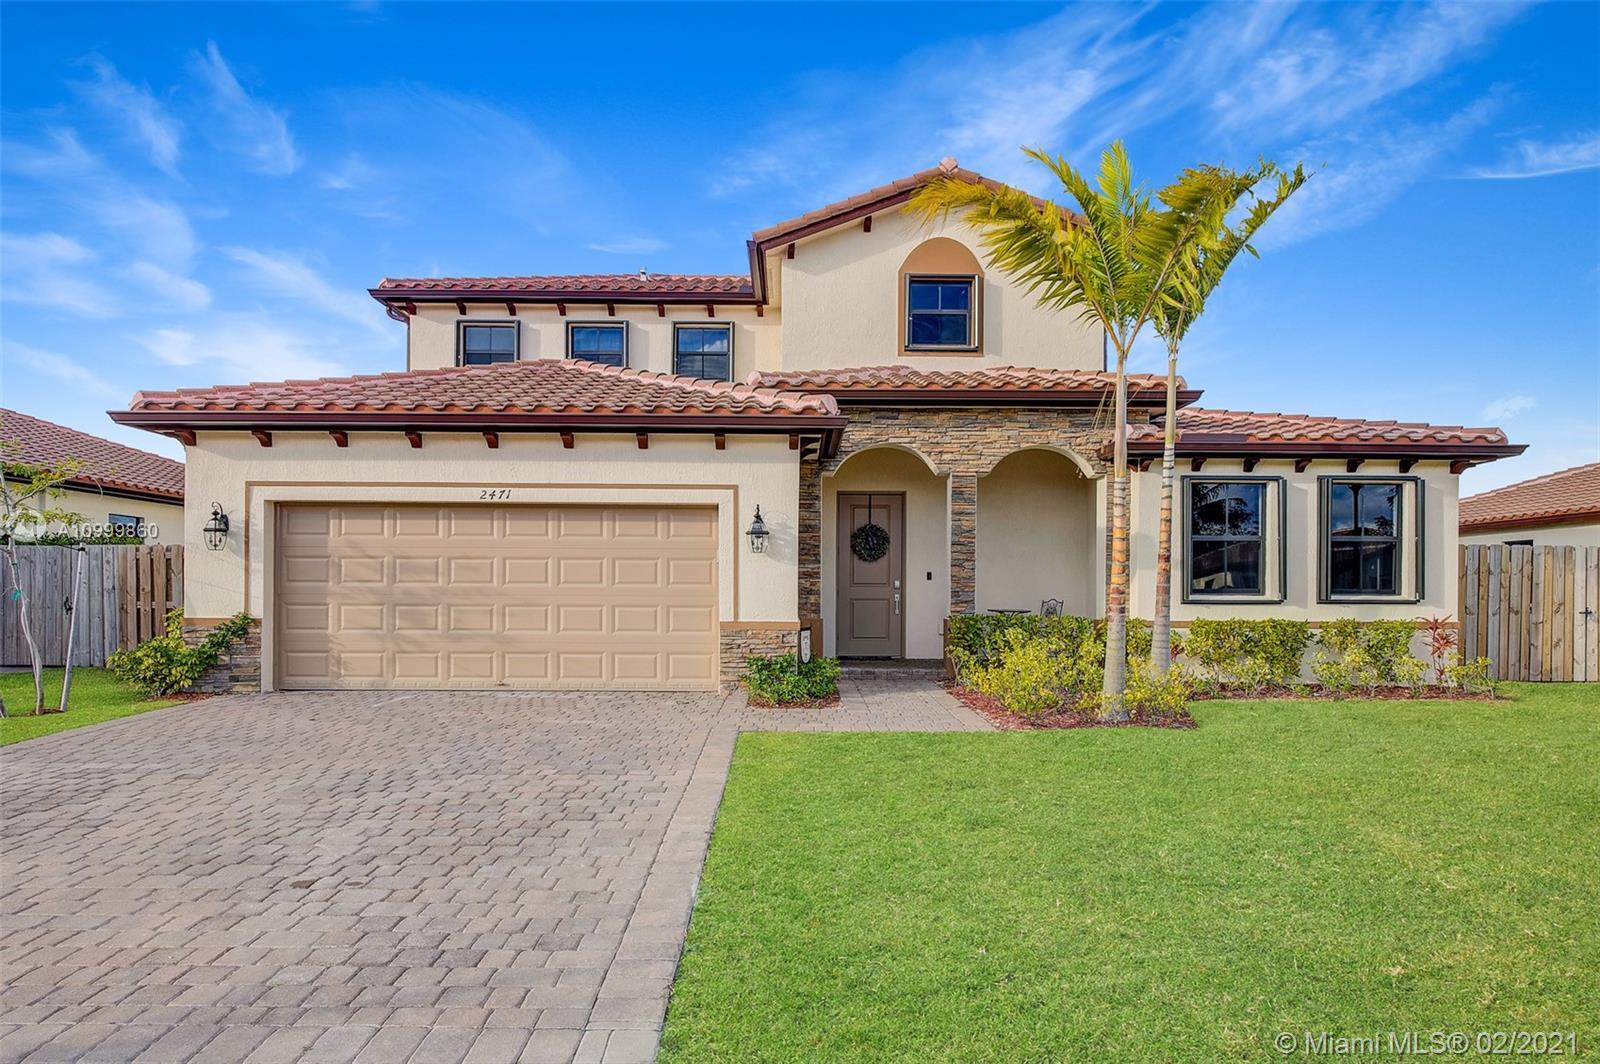 2471 SE 3rd St Property Photo - Homestead, FL real estate listing